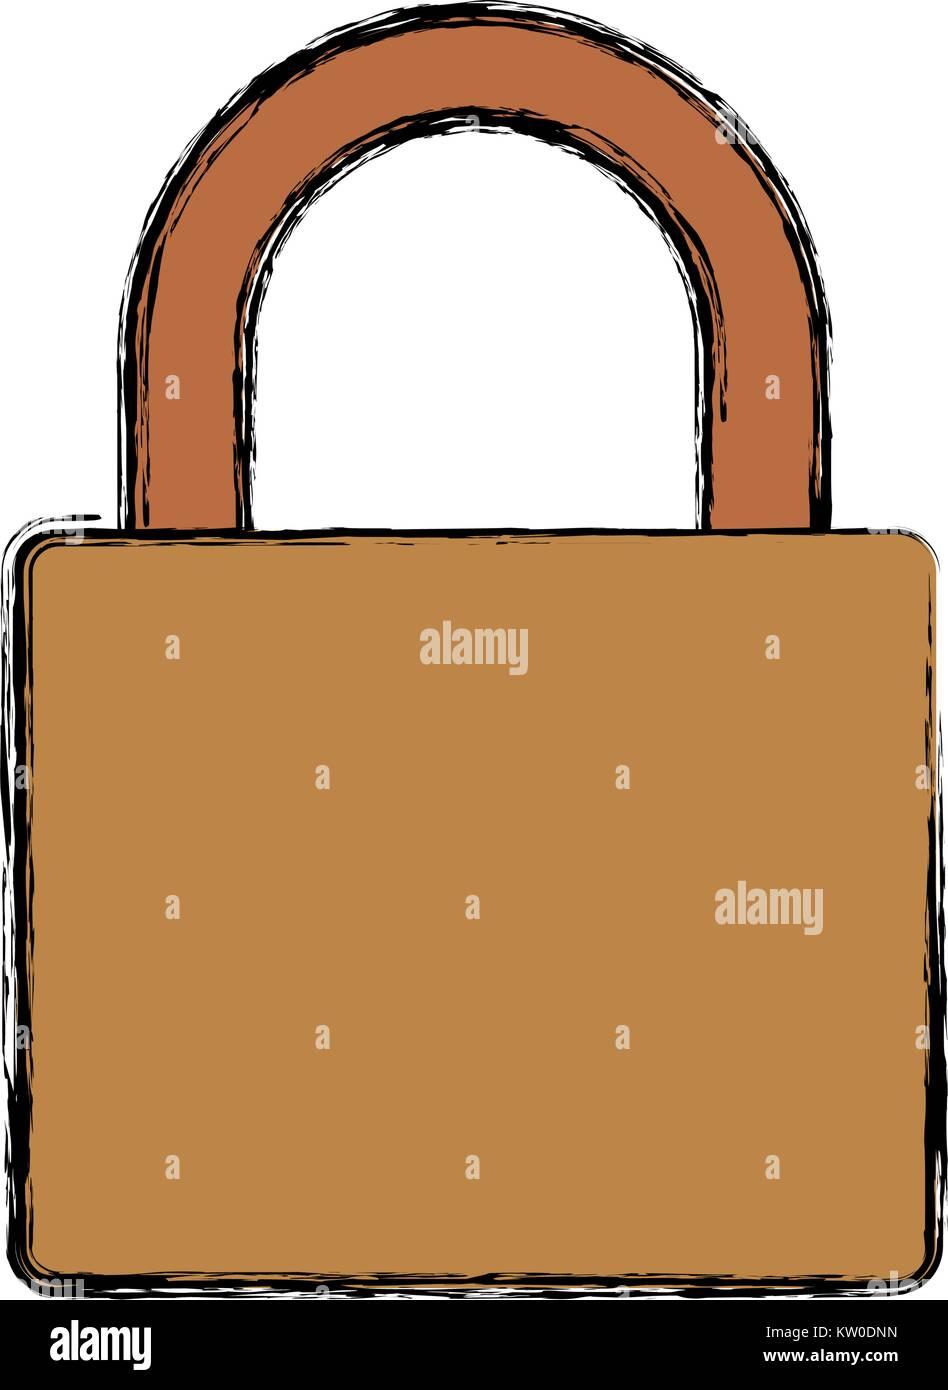 locked padlock icon - Stock Image